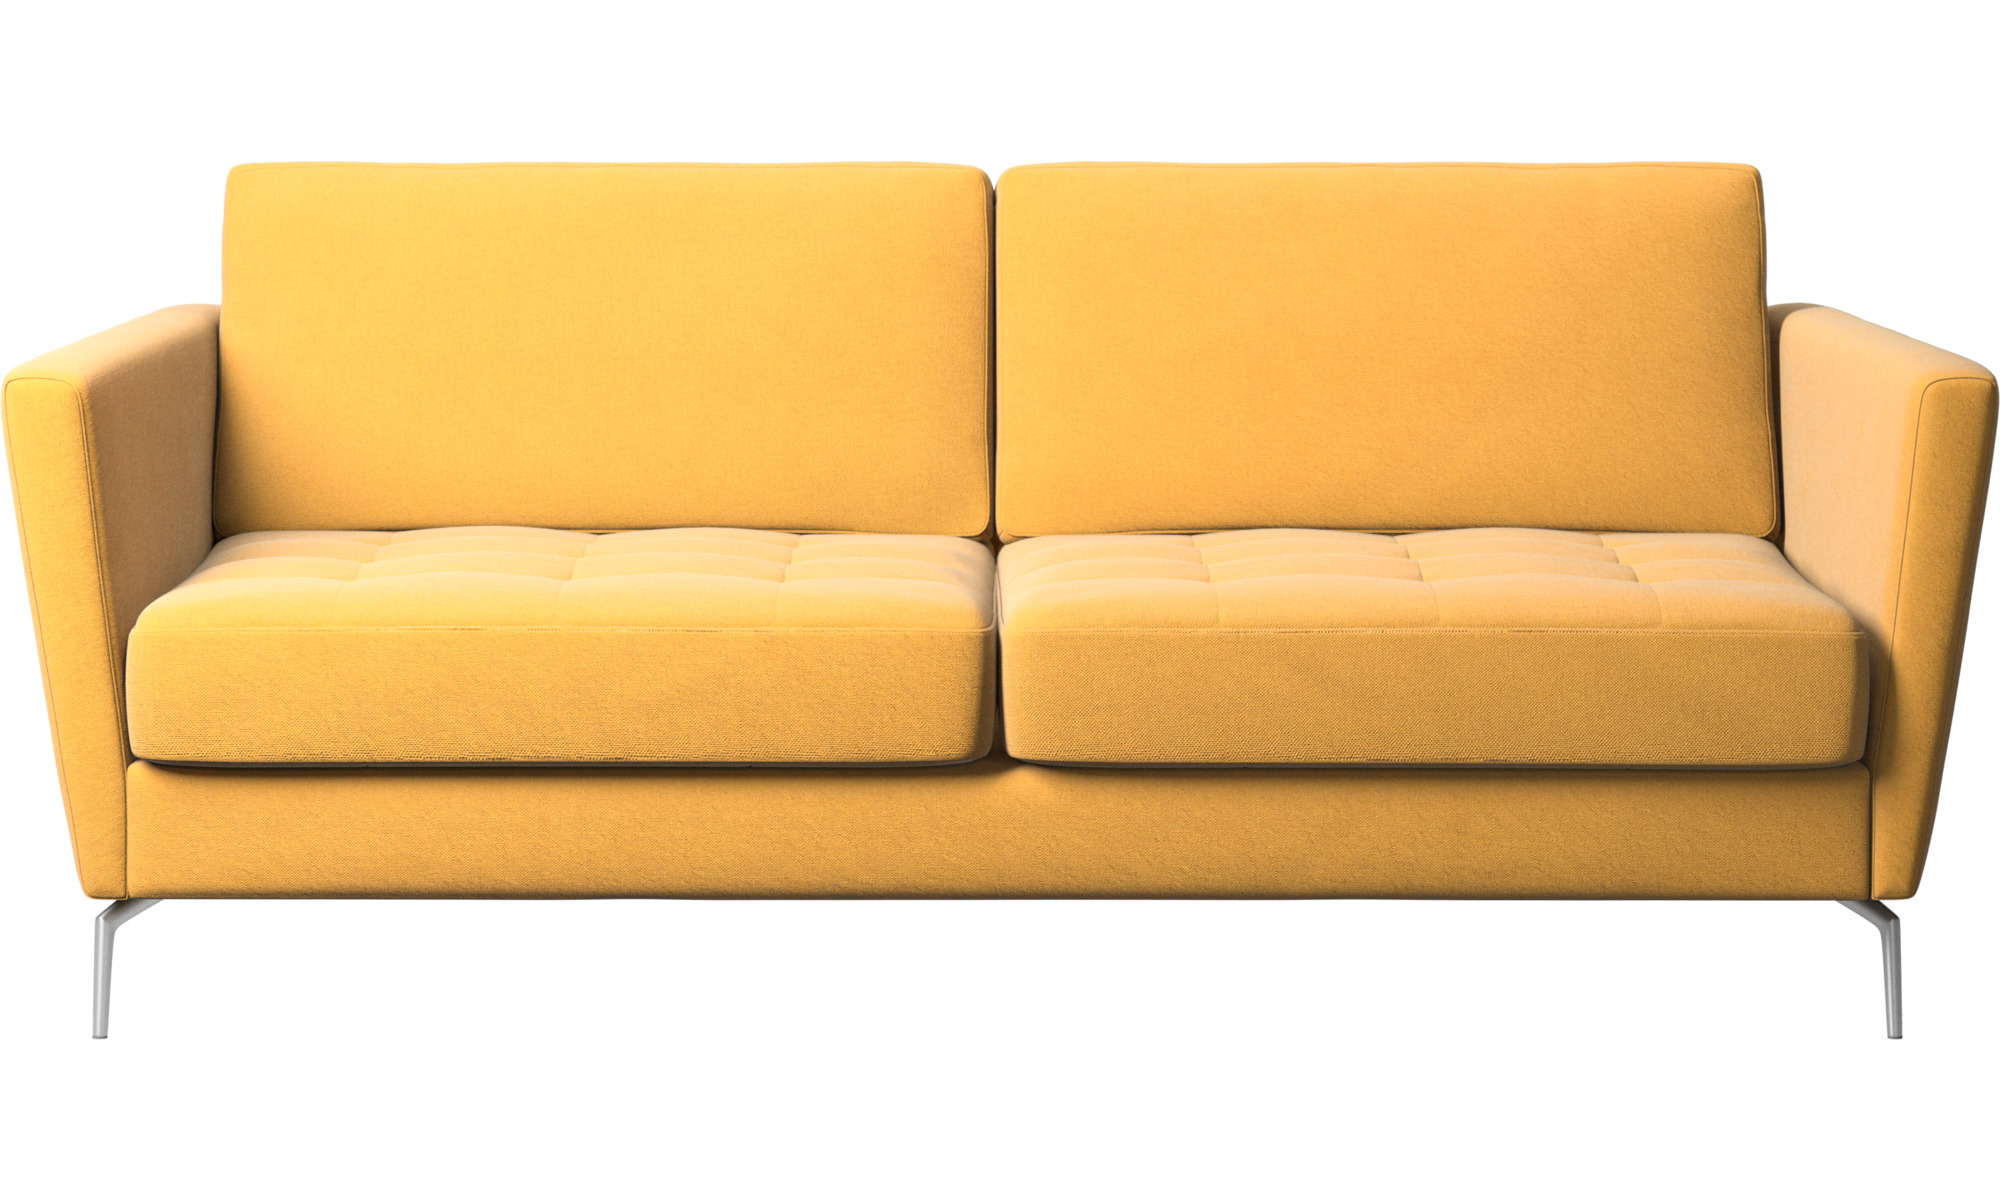 Sofás cama - Sofá cama Osaka, asiento capitoné - En amarillo - Tela